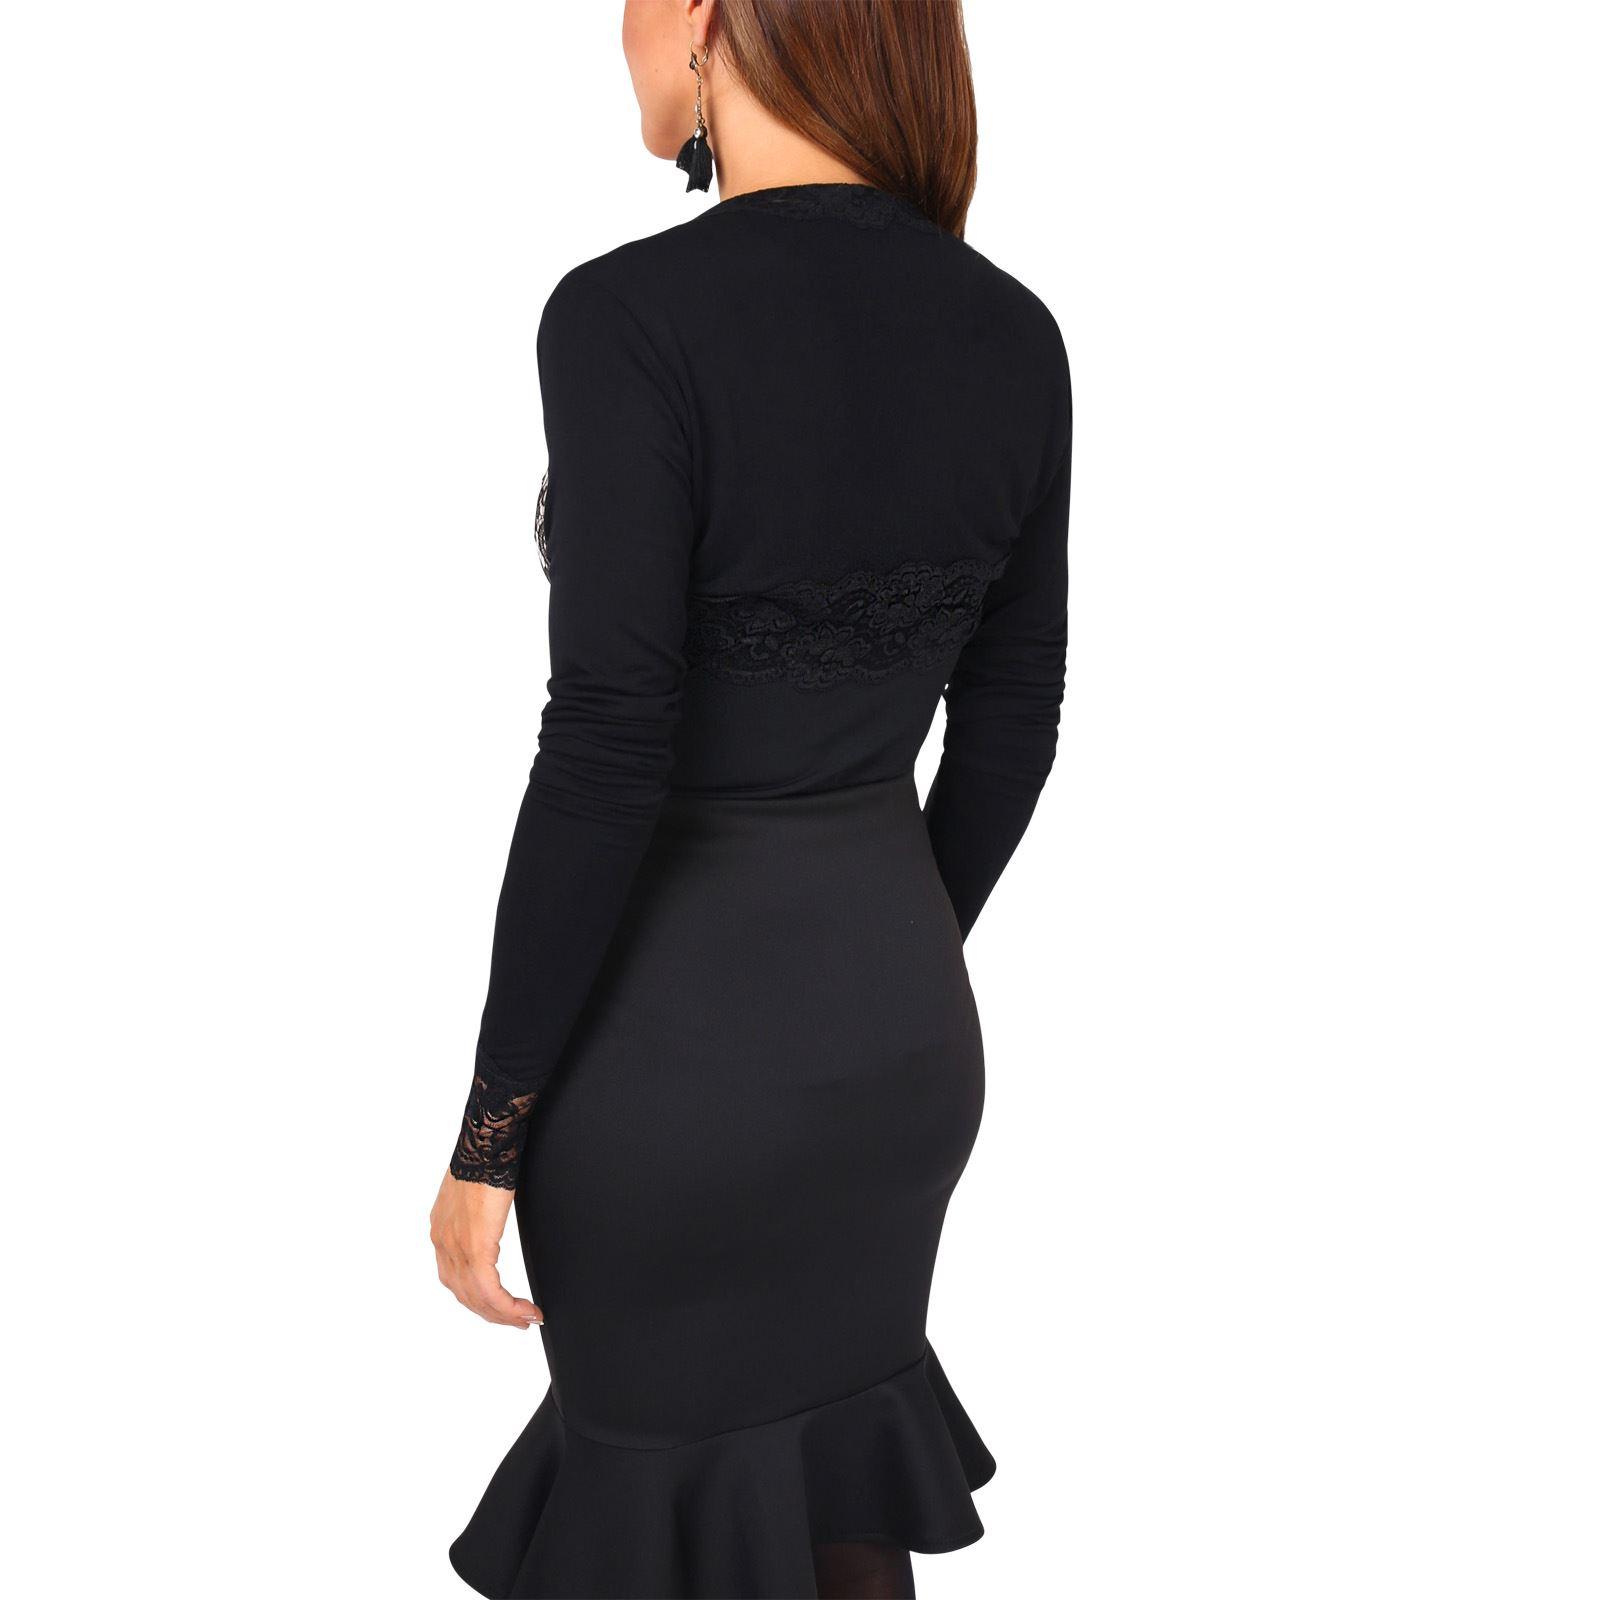 Femme-Bolero-Cardigan-Gilet-Dentelle-Crochet-Soiree-Classique-Uni-Court-Elegant miniature 9